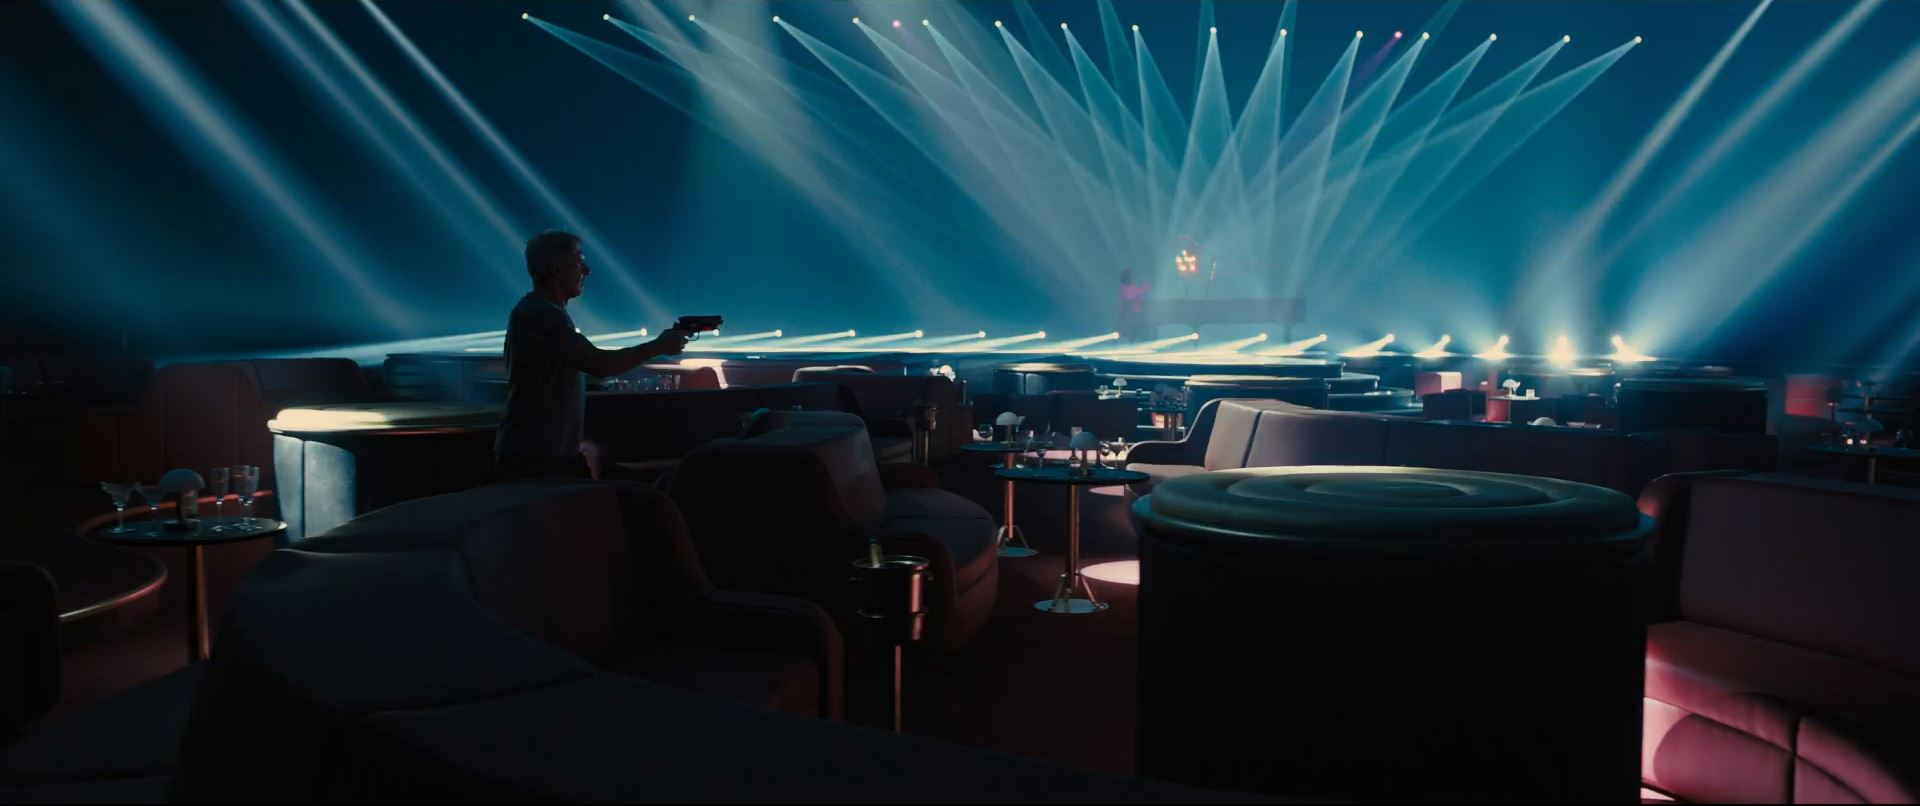 Harrison-Ford-as-Rick-Deckard-in-Blade-Runner-2049.jpg